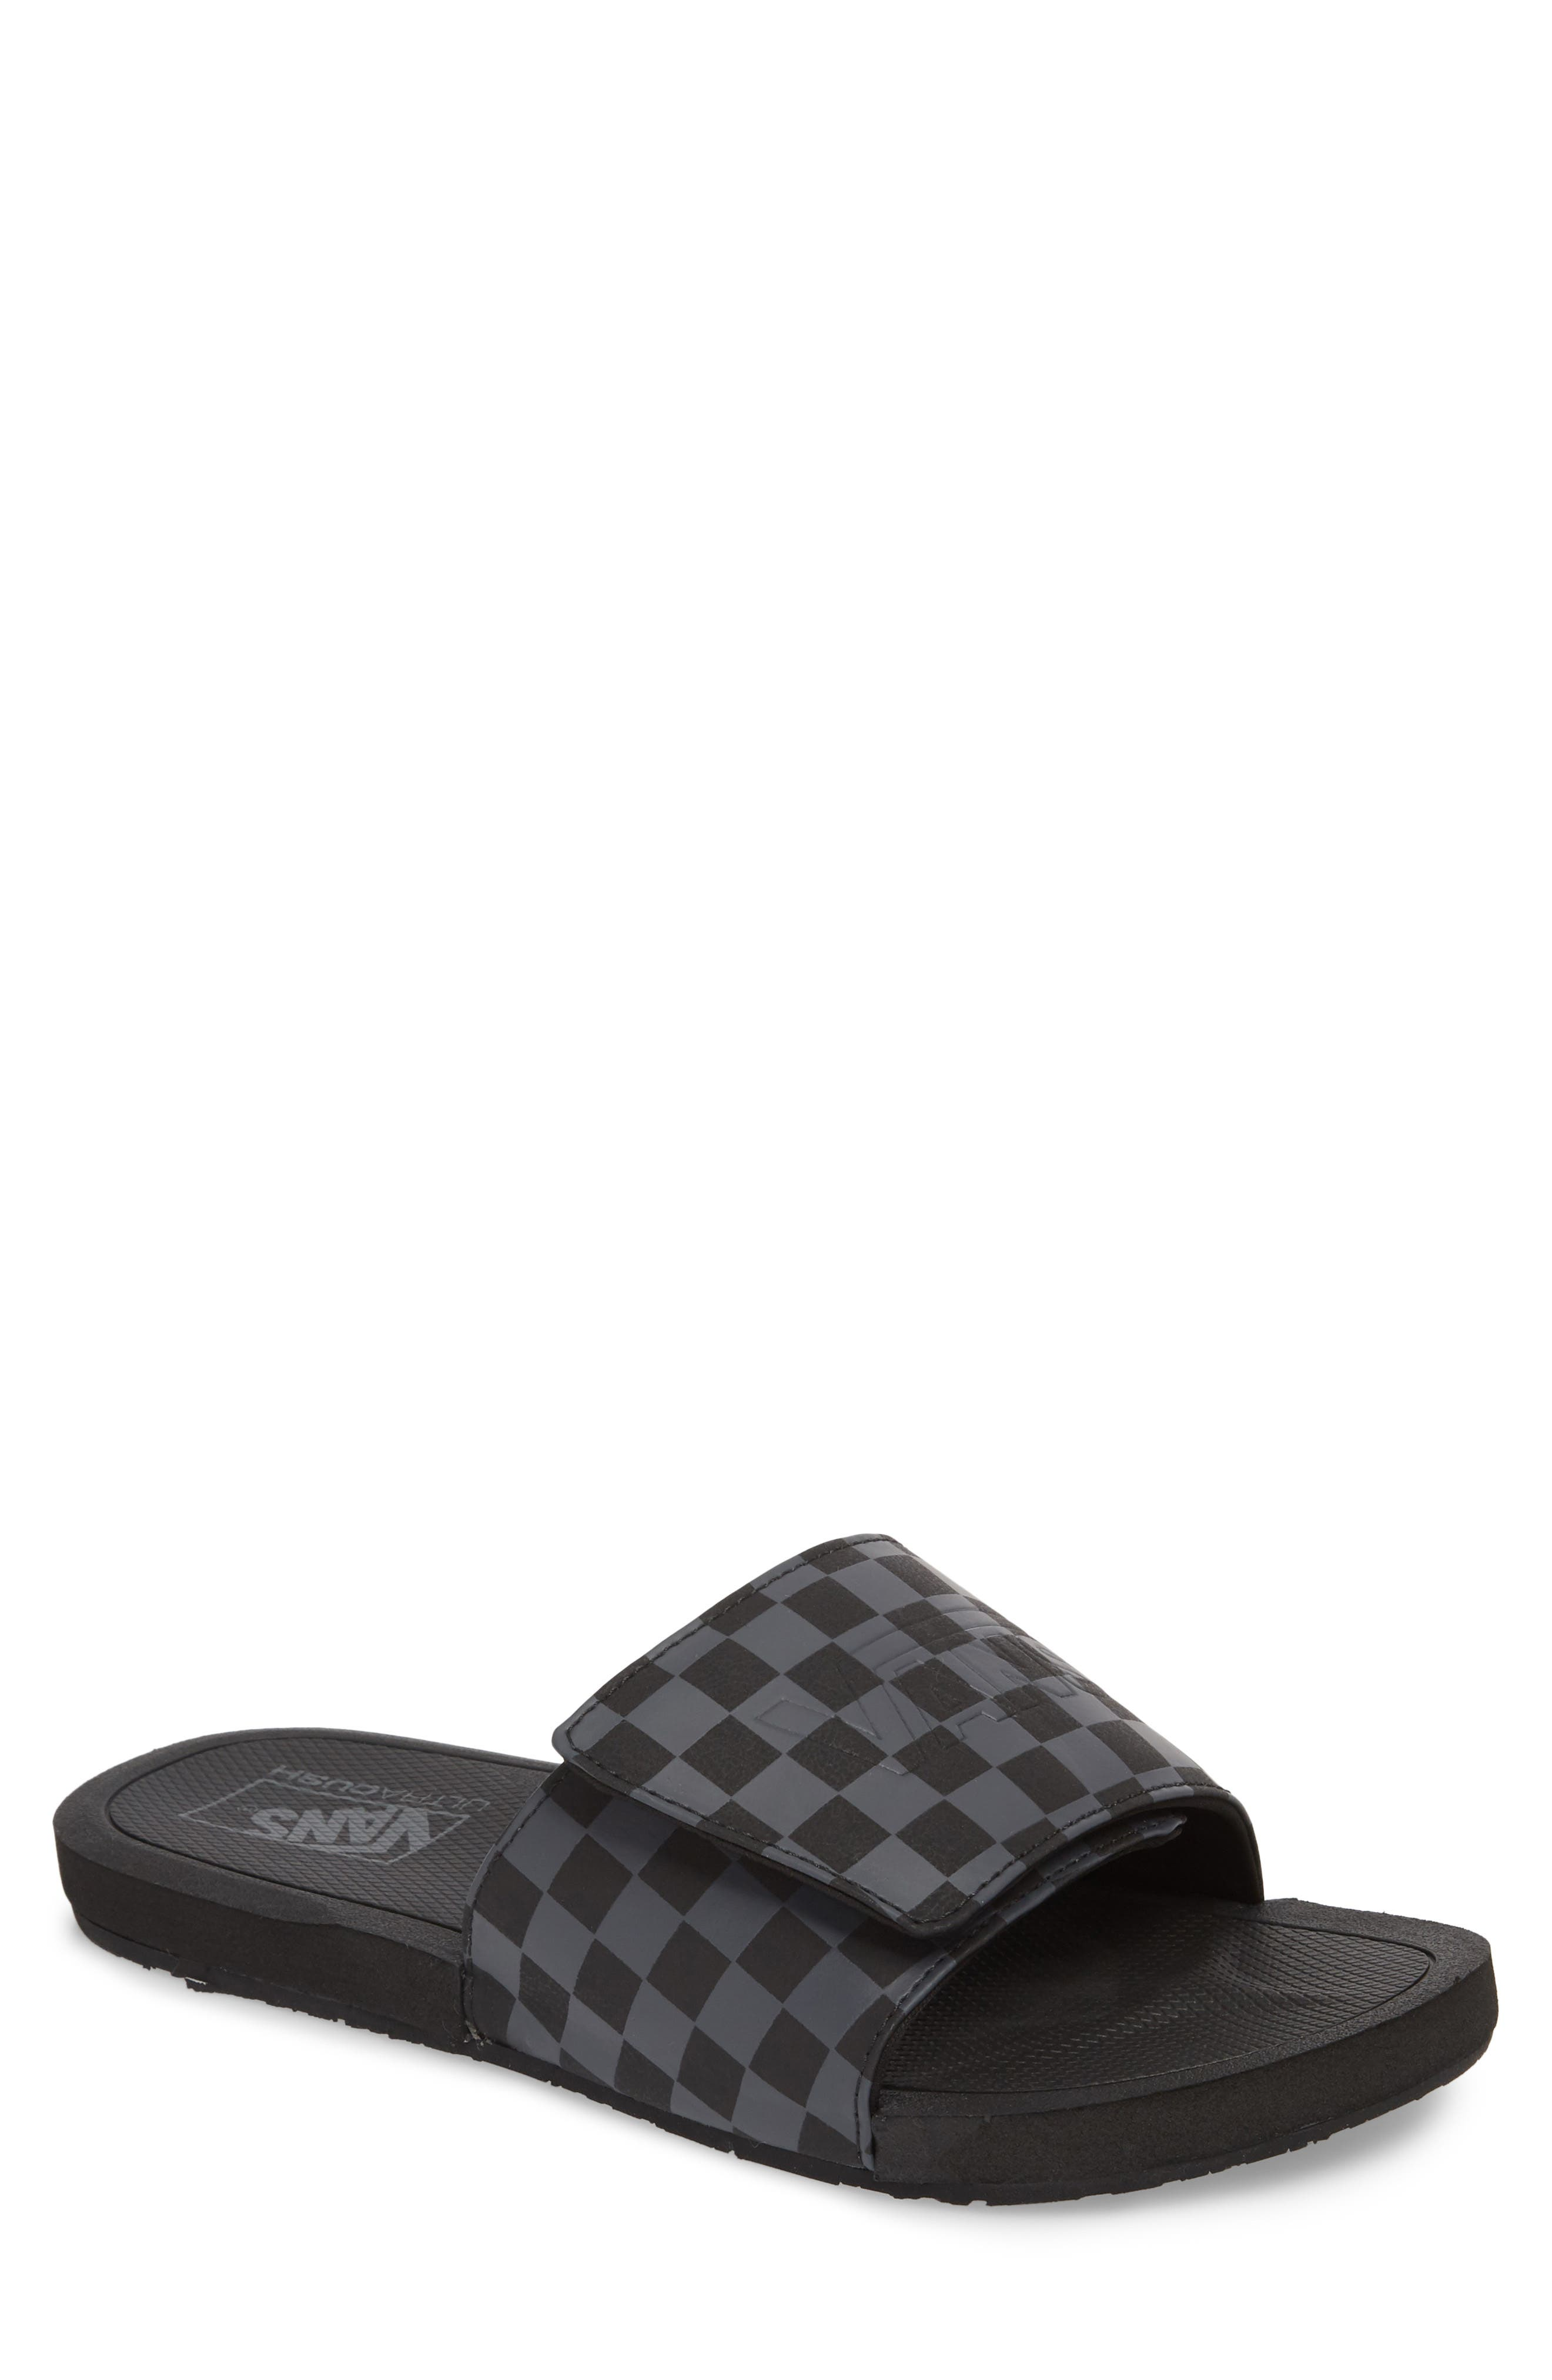 Main Image - Vans Nexpa Slide Sandal (Men)